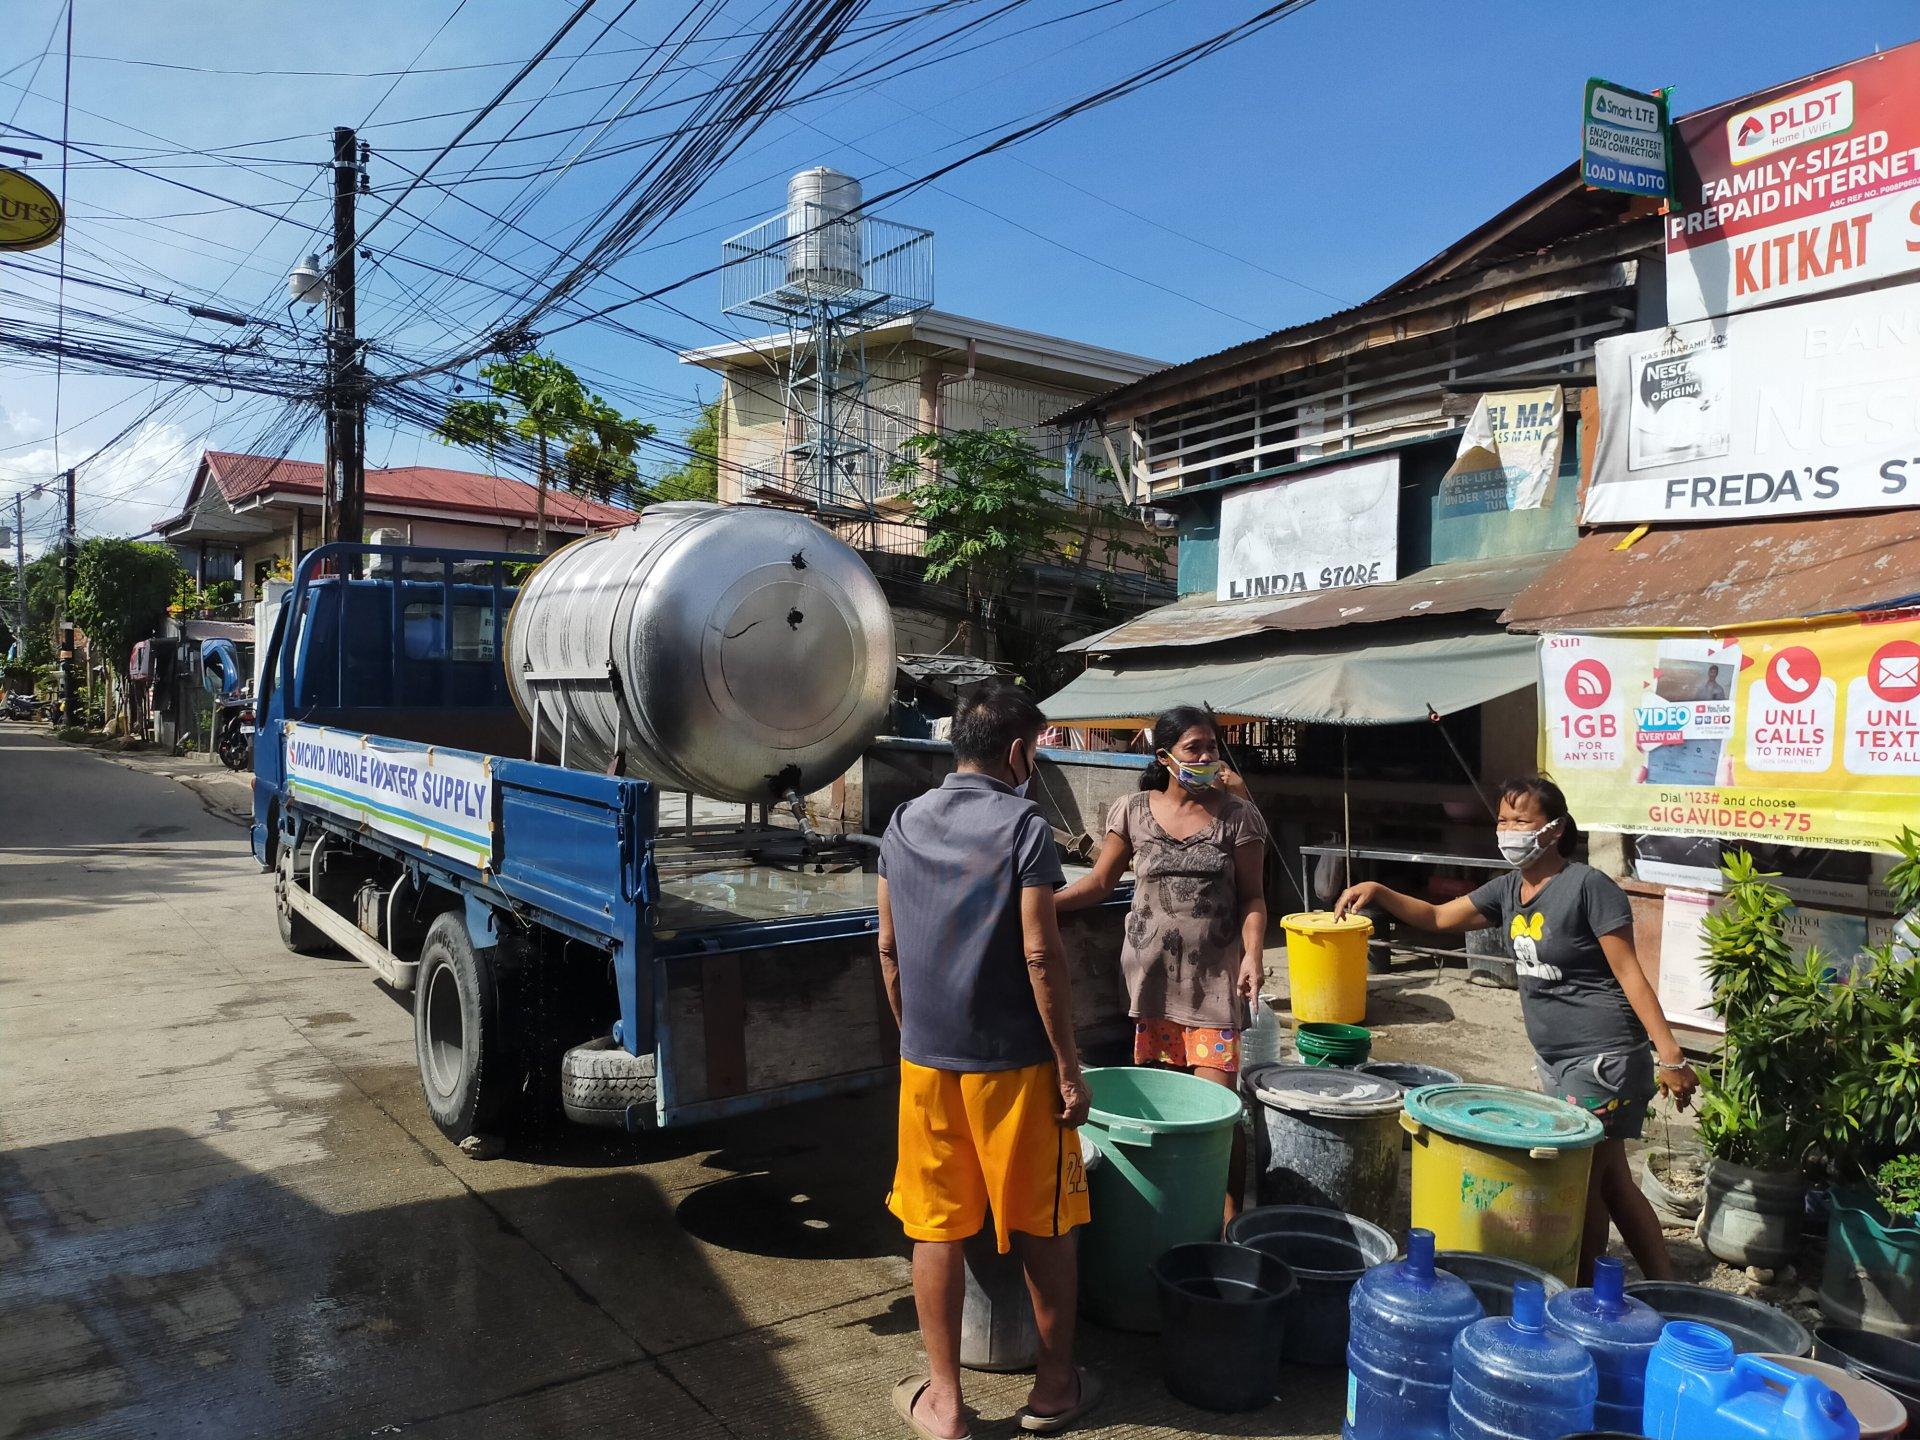 https://www.waterforlife.nl/files/visuals/_1920x1920_fit_center-center_85_none/Water-truck-providing-free-water-to-urban-poor-Cebu.jpg